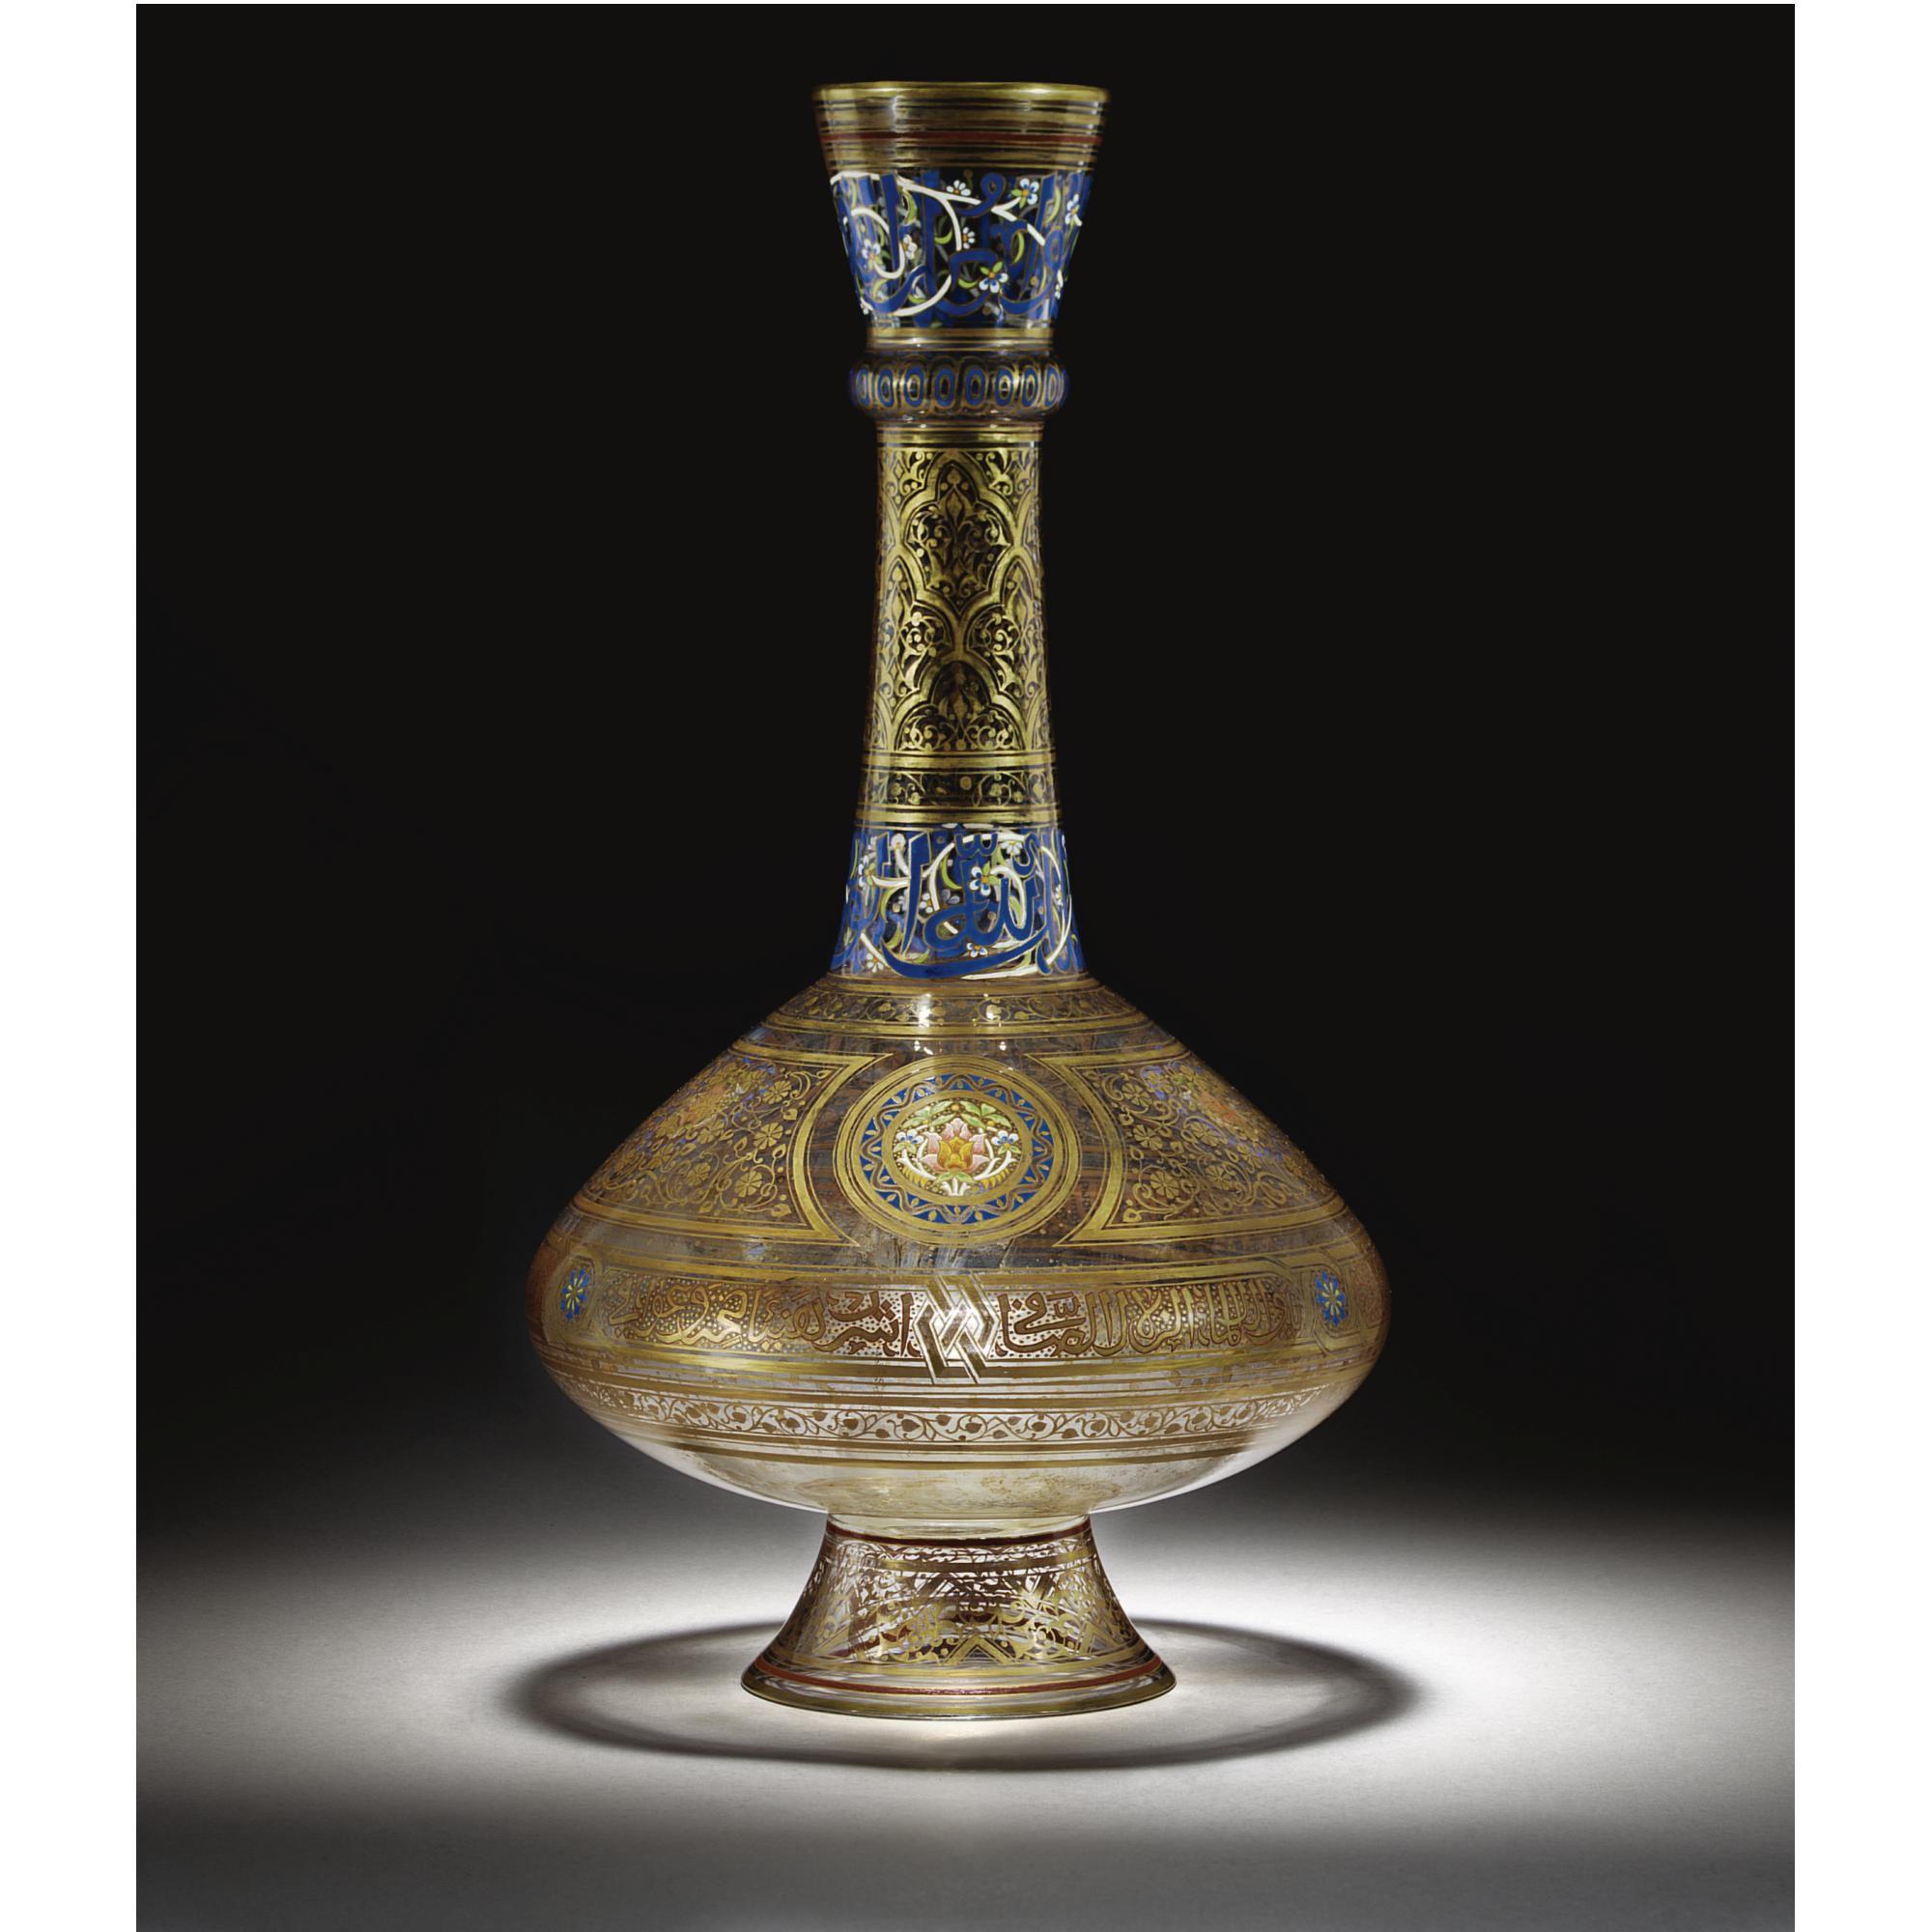 A Large J L Lobmeyr Enamelled Persian Style Glass Bottle